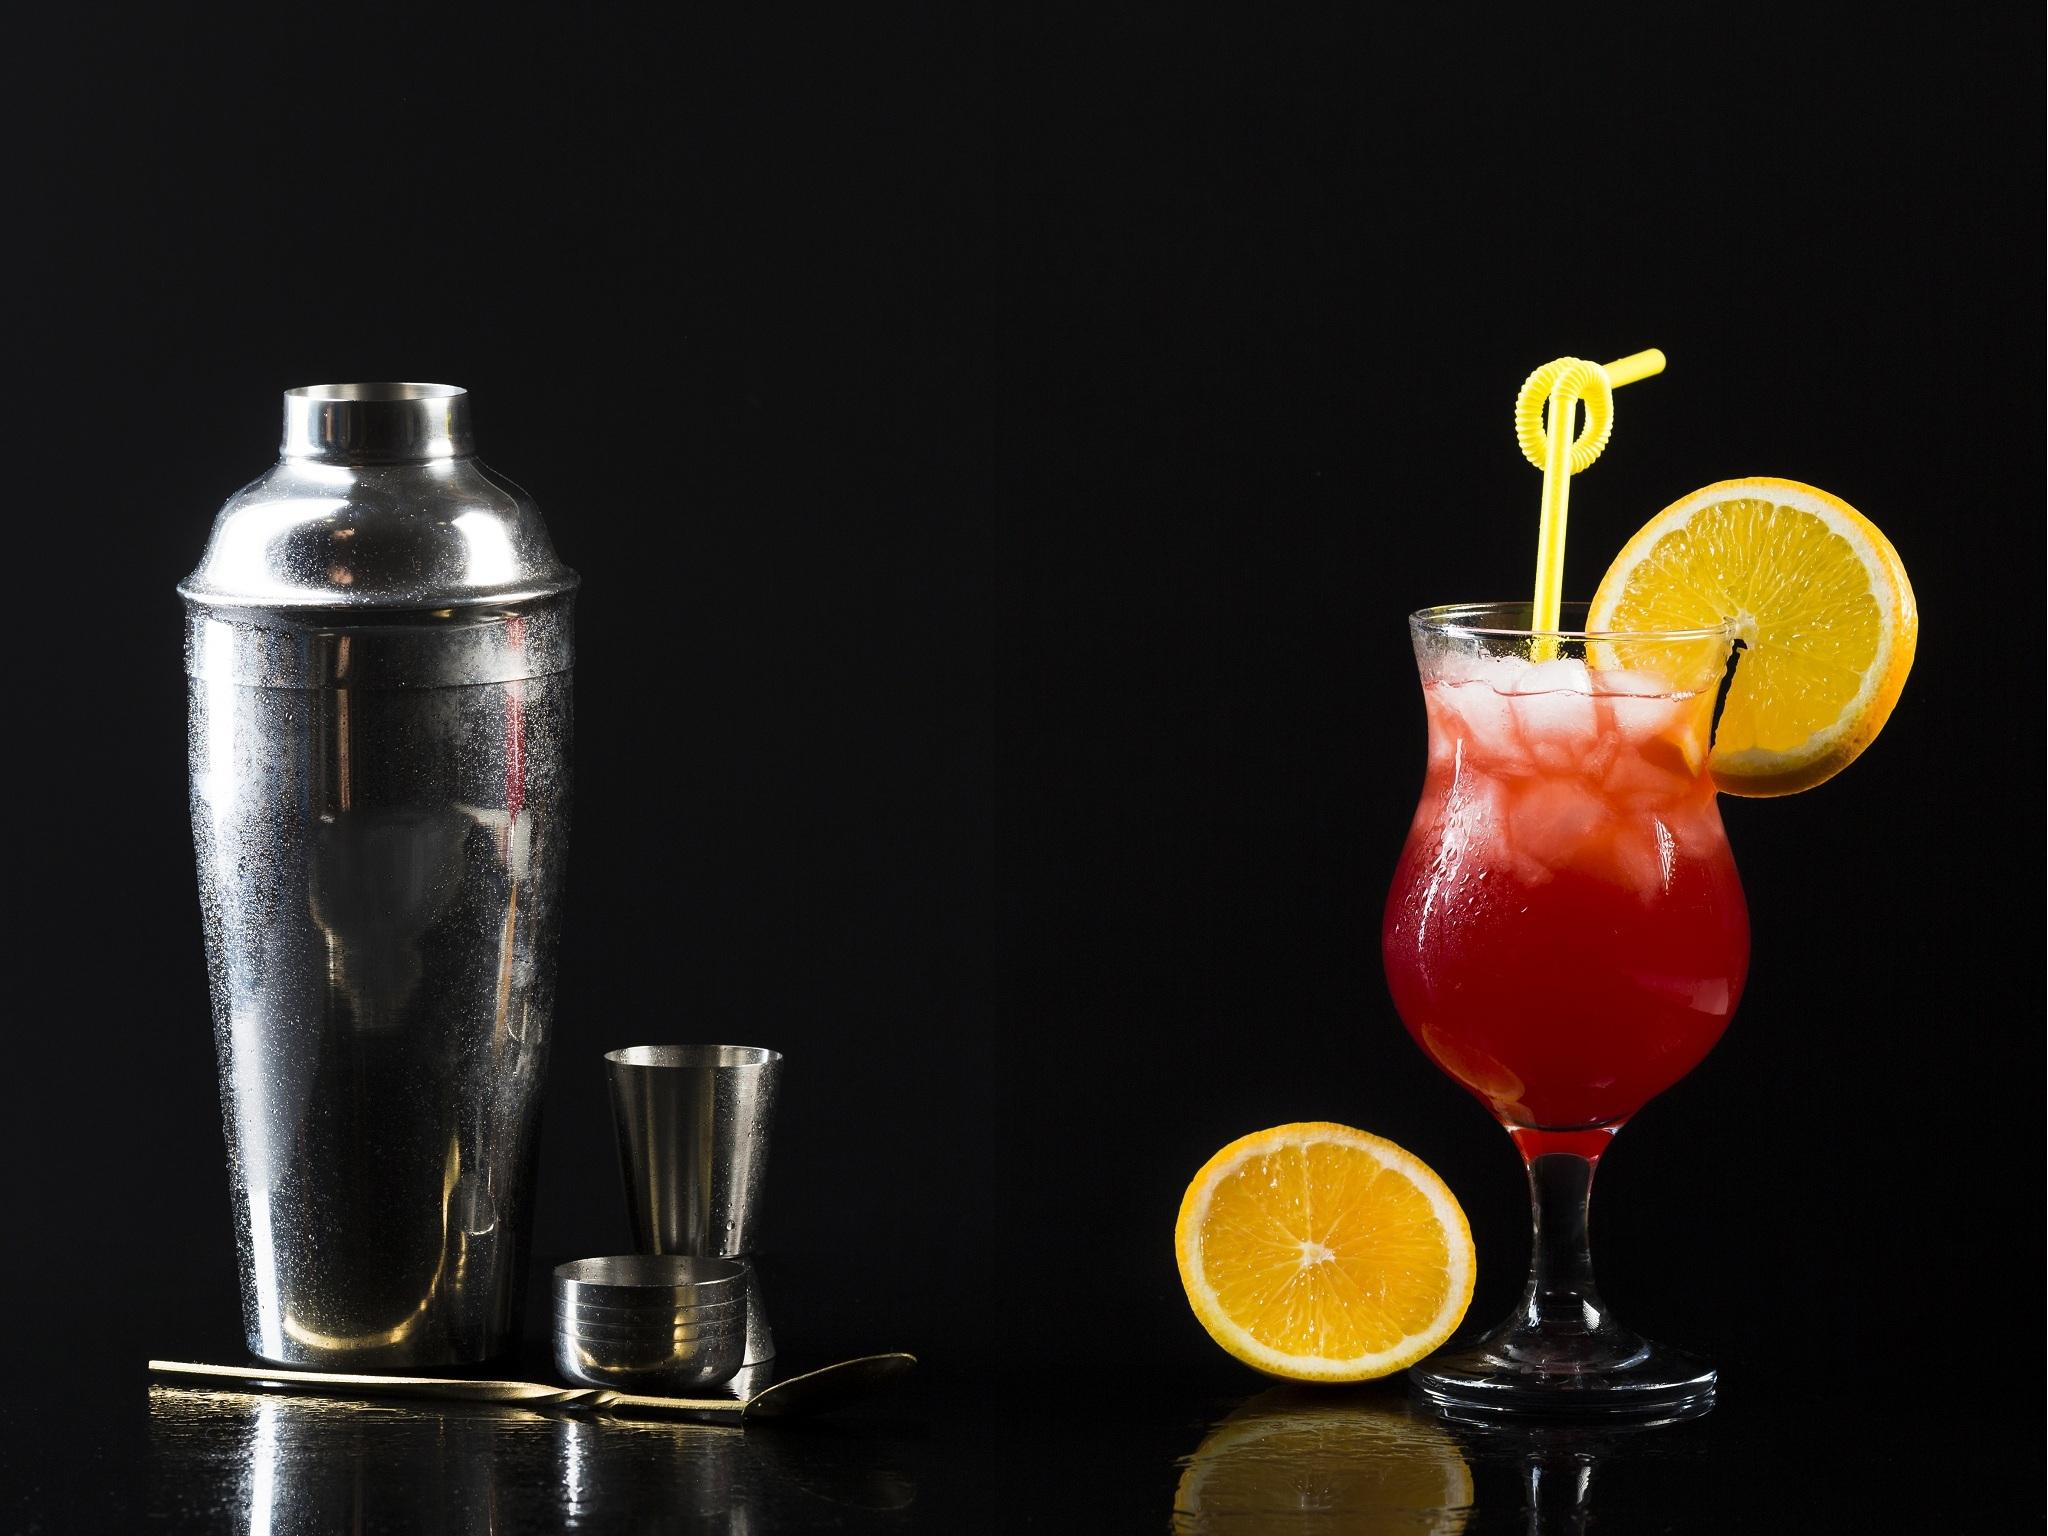 Noite, Bebidas, Cocktail & Shaker